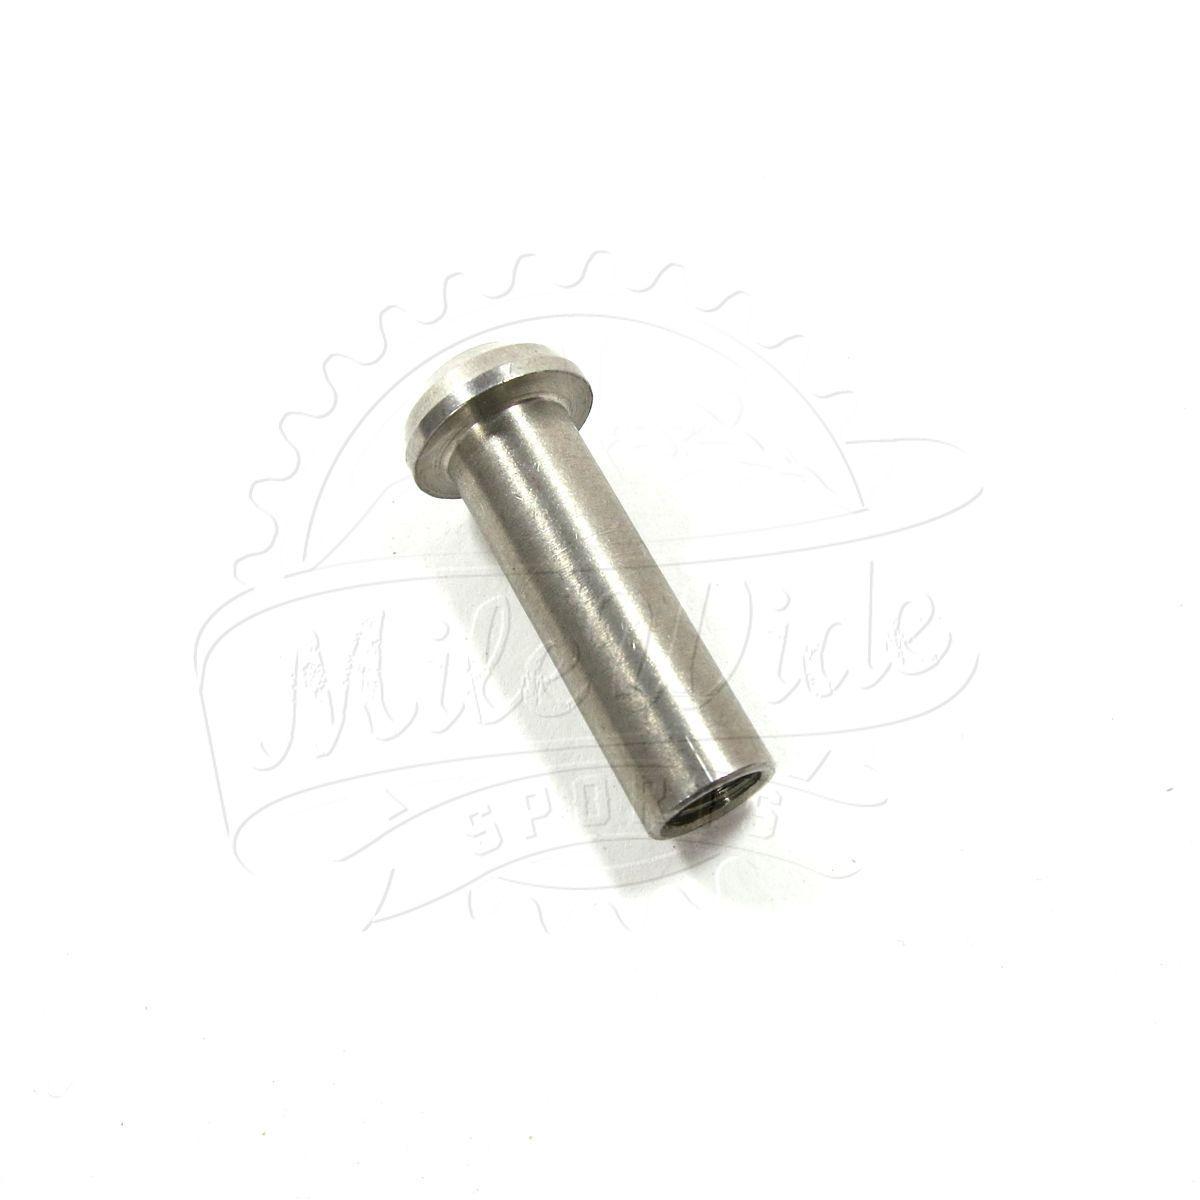 Stainless Steel 28mm Brake Bolt Nut for Road Tri Bike Forks 7g